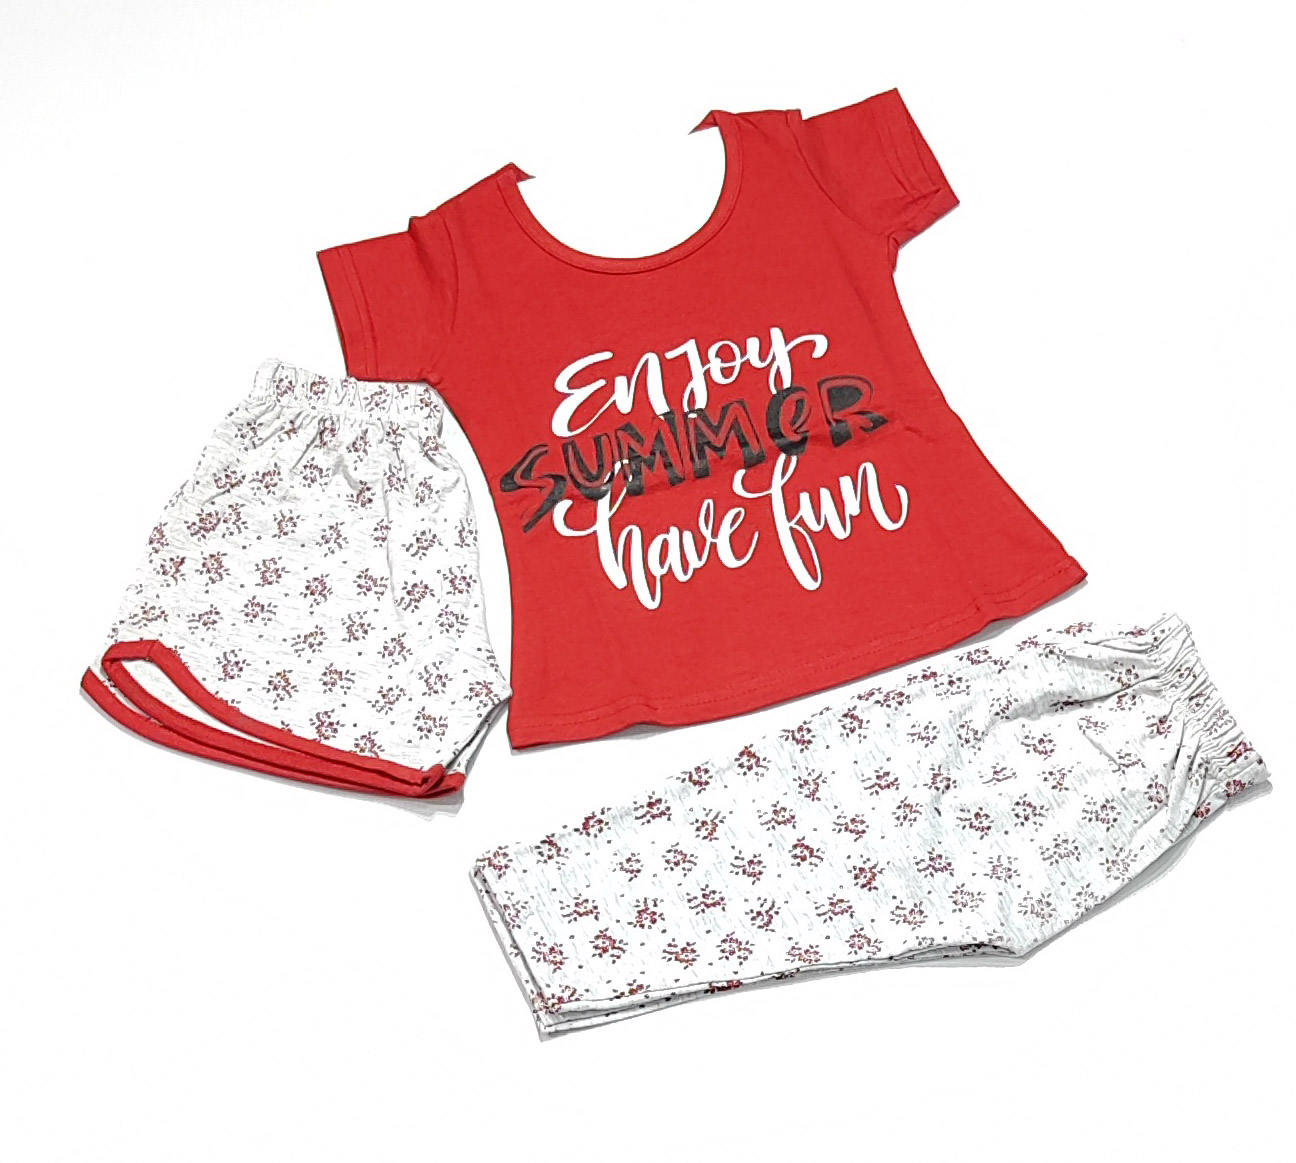 AAAKAR   Girl's Graphic Printed Top, Shorts And Capri Combo Set